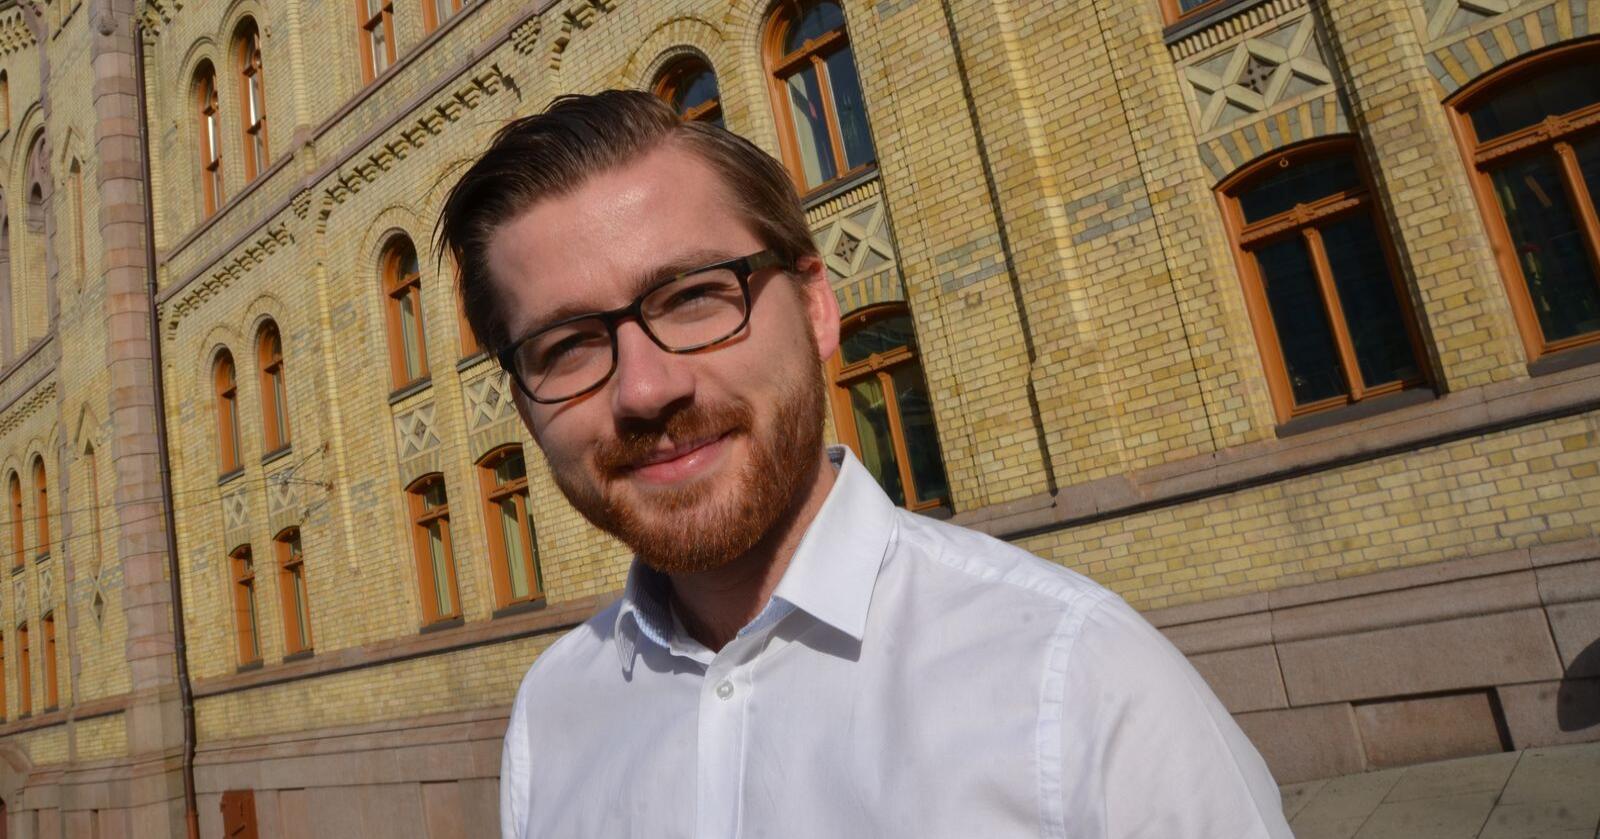 Sveinung Rotevatn (V) er ny klima- og miljøminister, og regjeringens øverste fagansvarlige for Norges rovviltpolitikk. De lokale nemndene forventer at den nye statsråden inntar en mer lyttende holdning til den lokale forvaltningen. (Anders Sandbu)